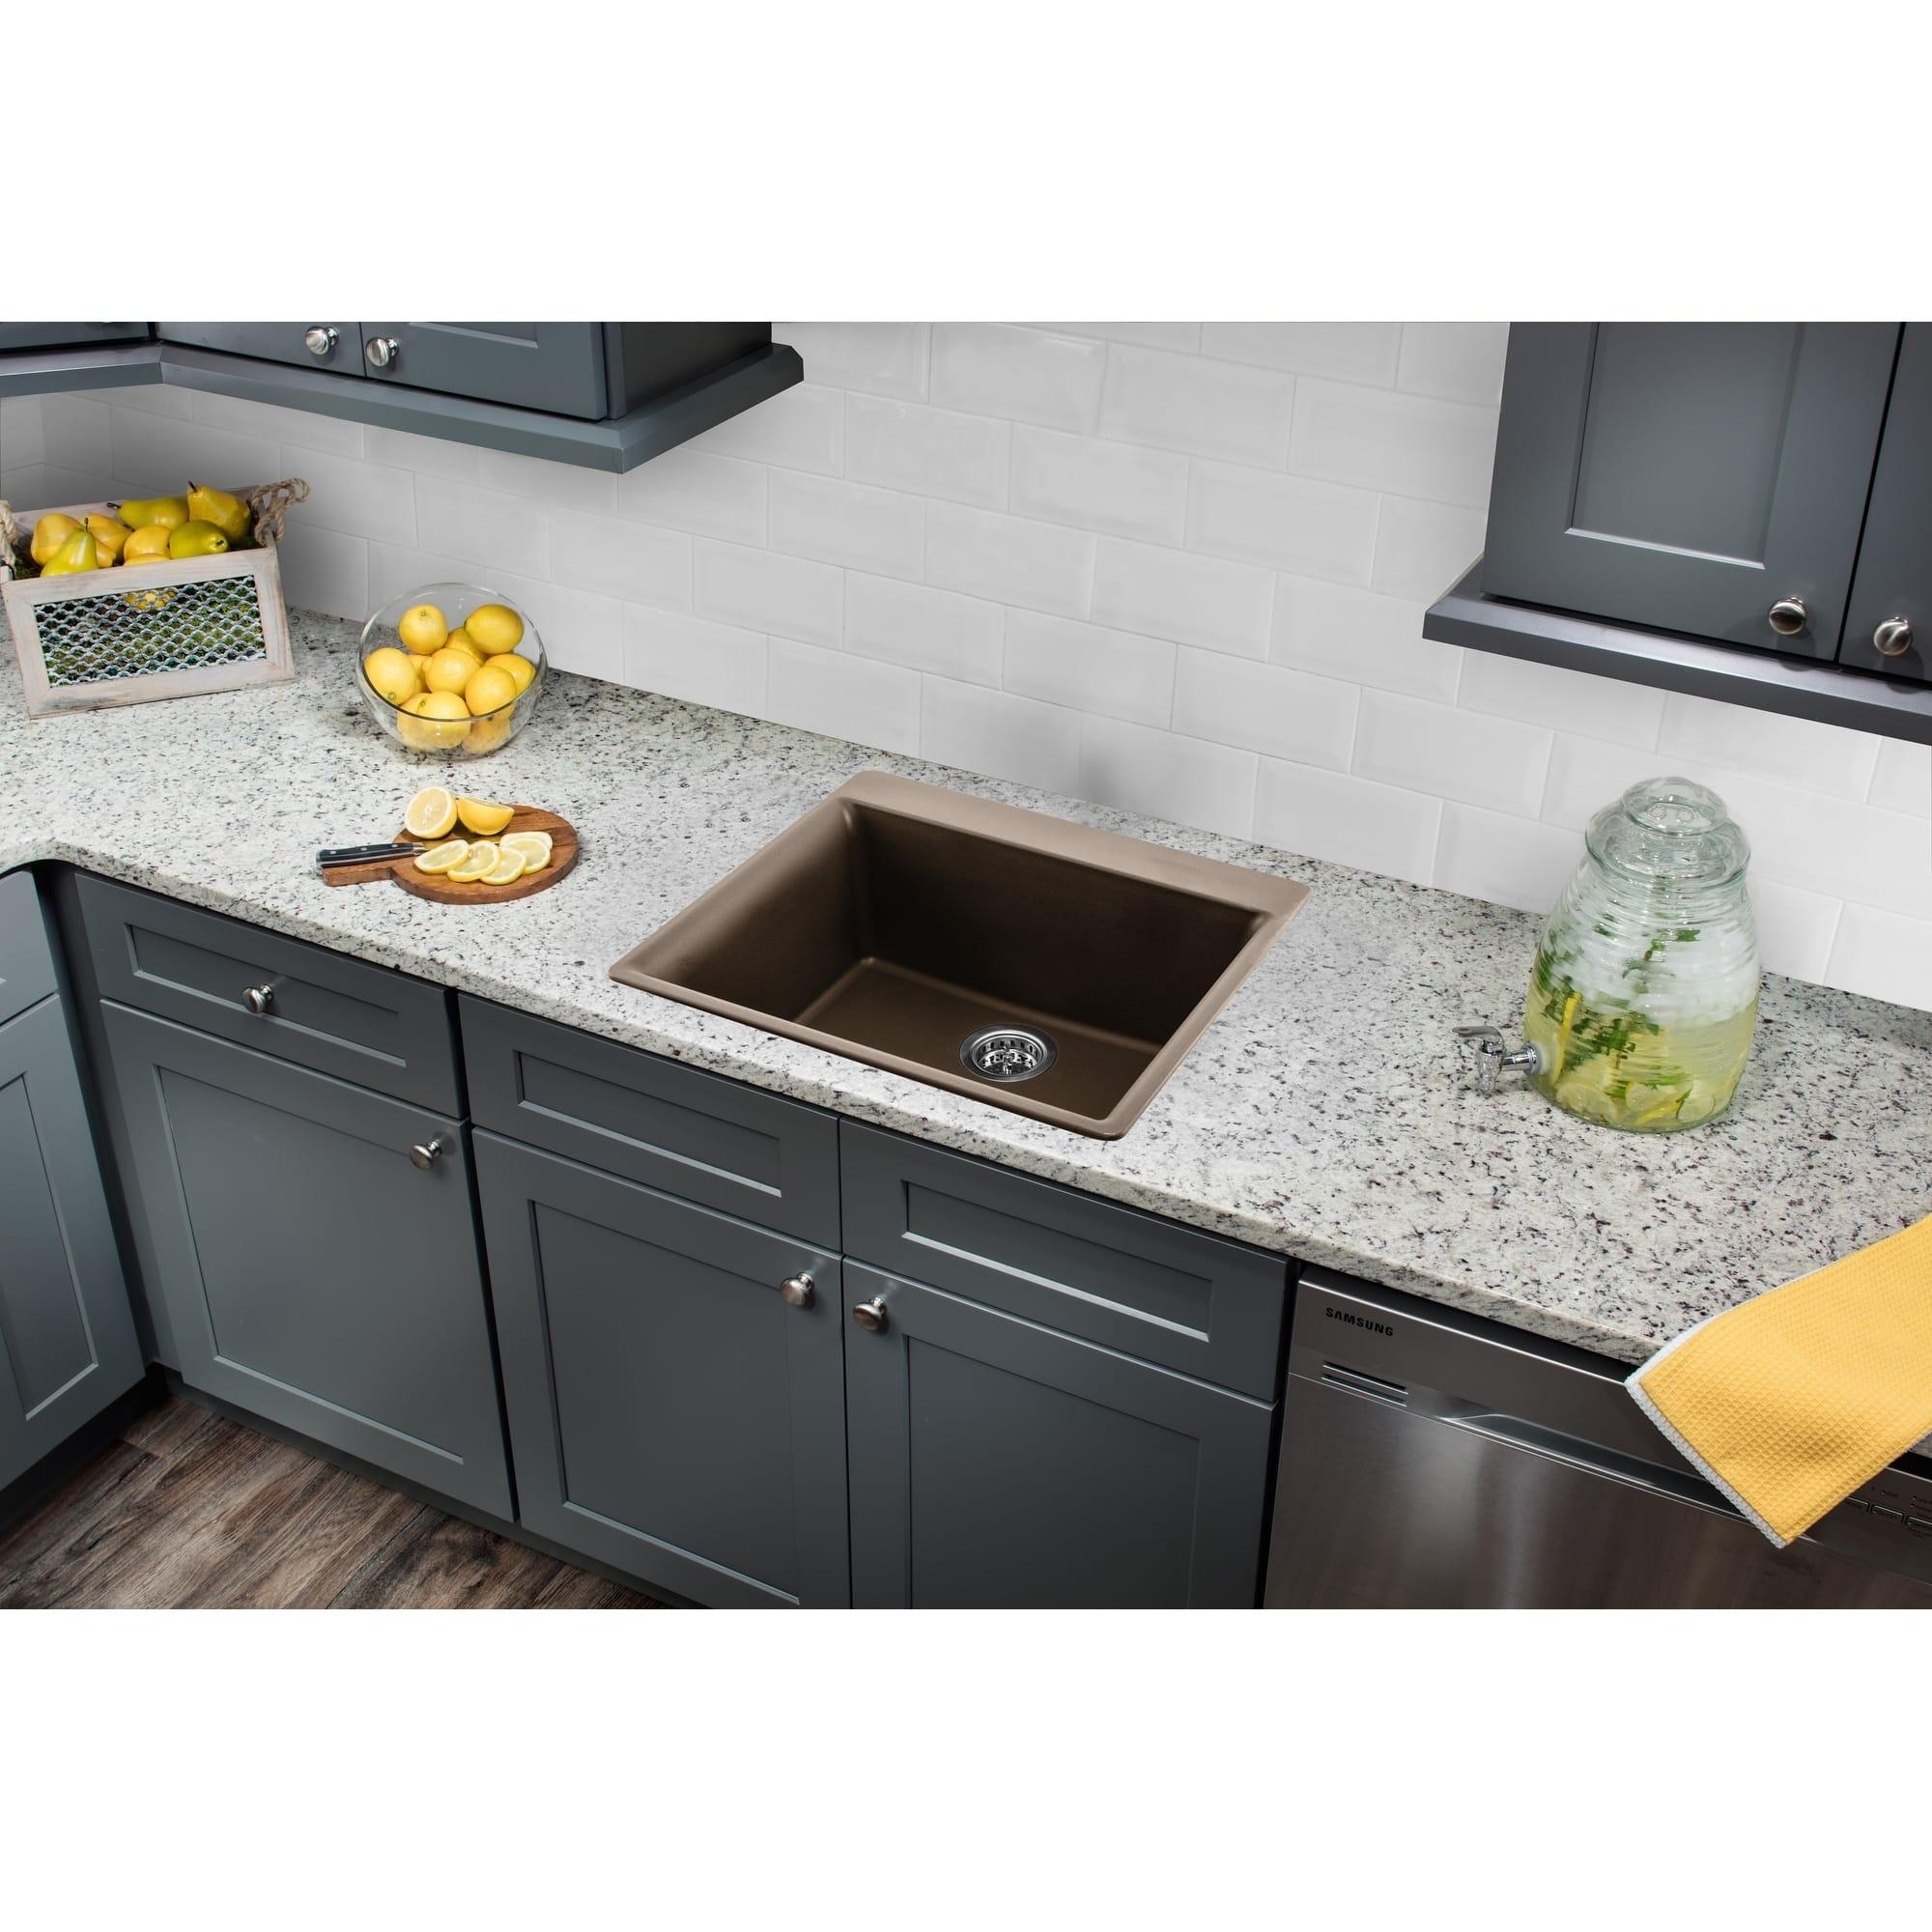 Buy Kitchen Sinks Online At Overstock